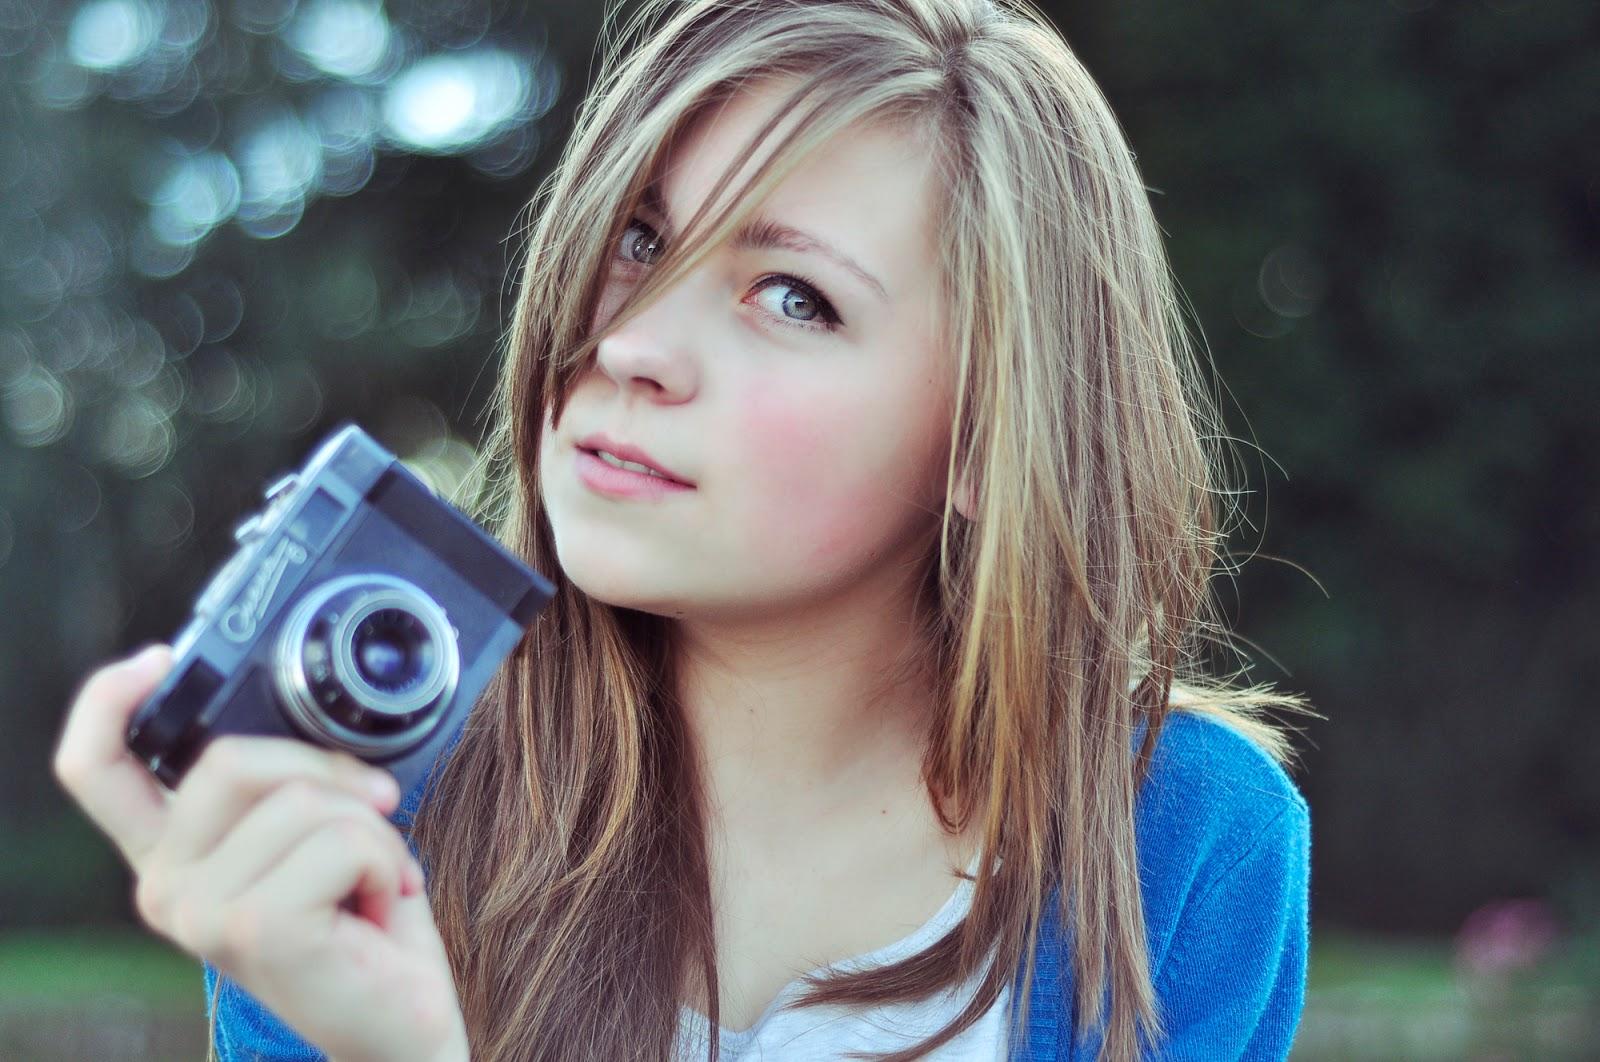 بالصور صور بنات للواتس , اجمل صور لبنات الواتس 3497 7